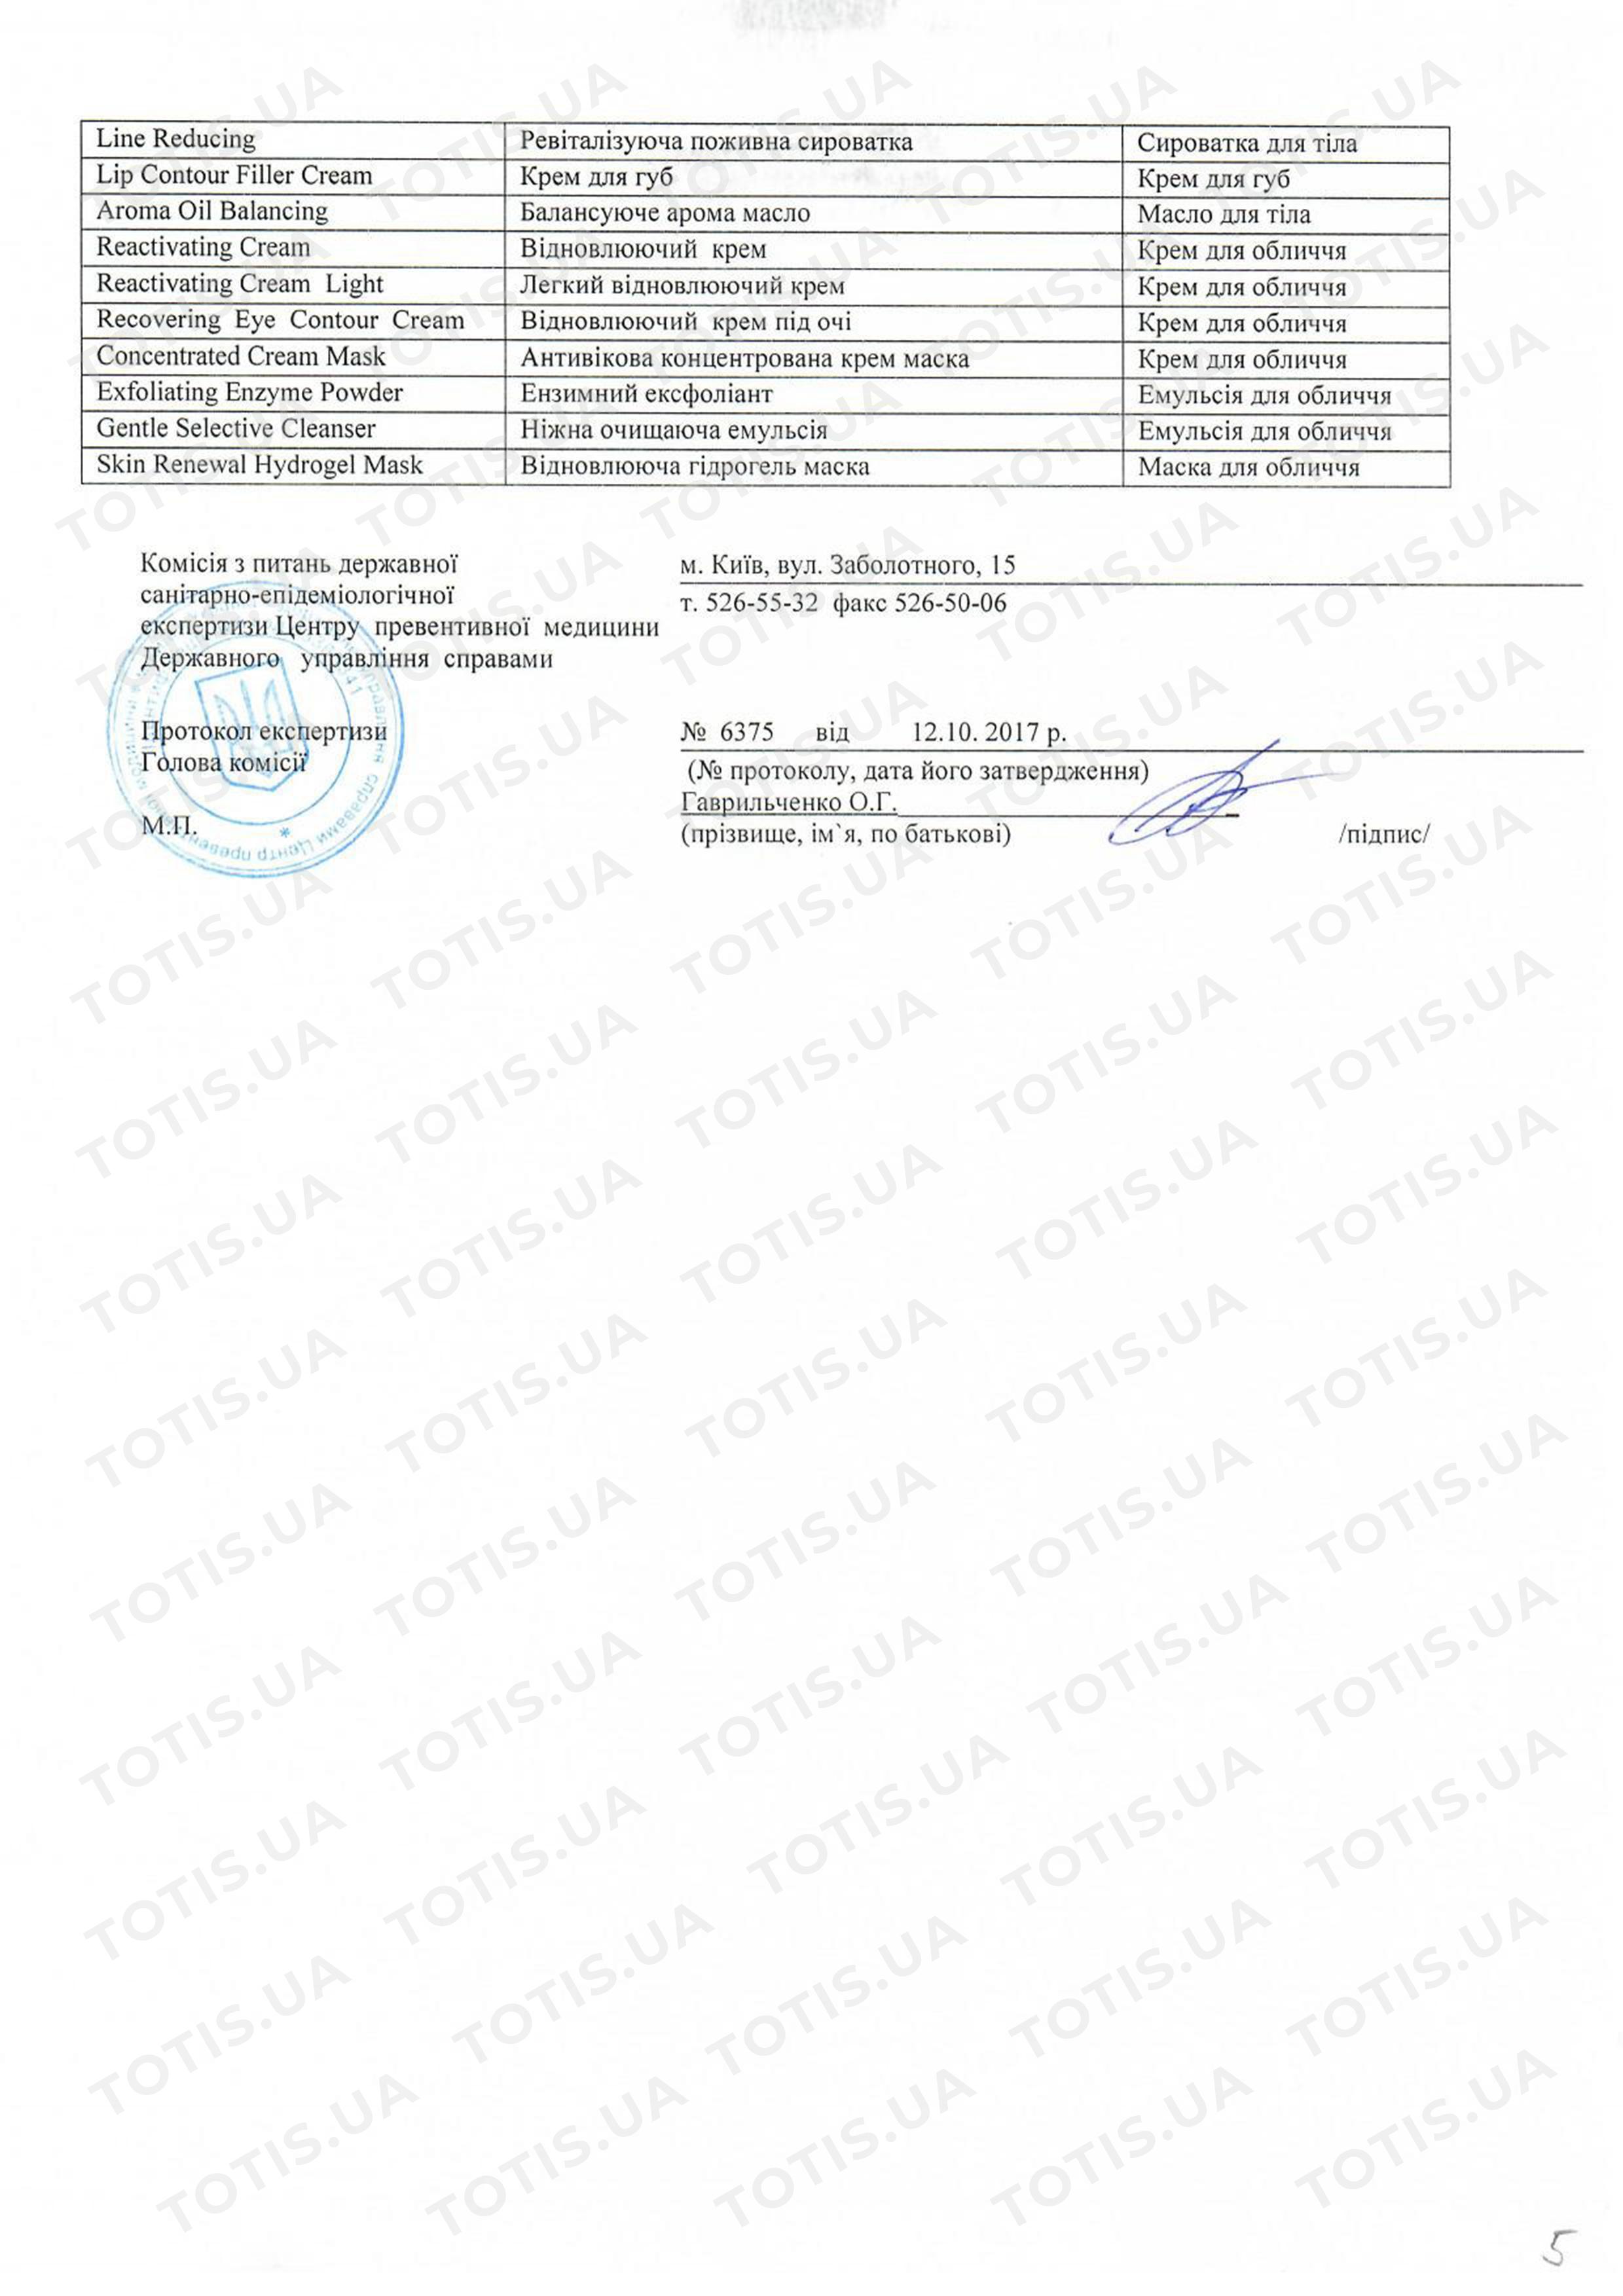 сертификат косметики доктор шпиллер